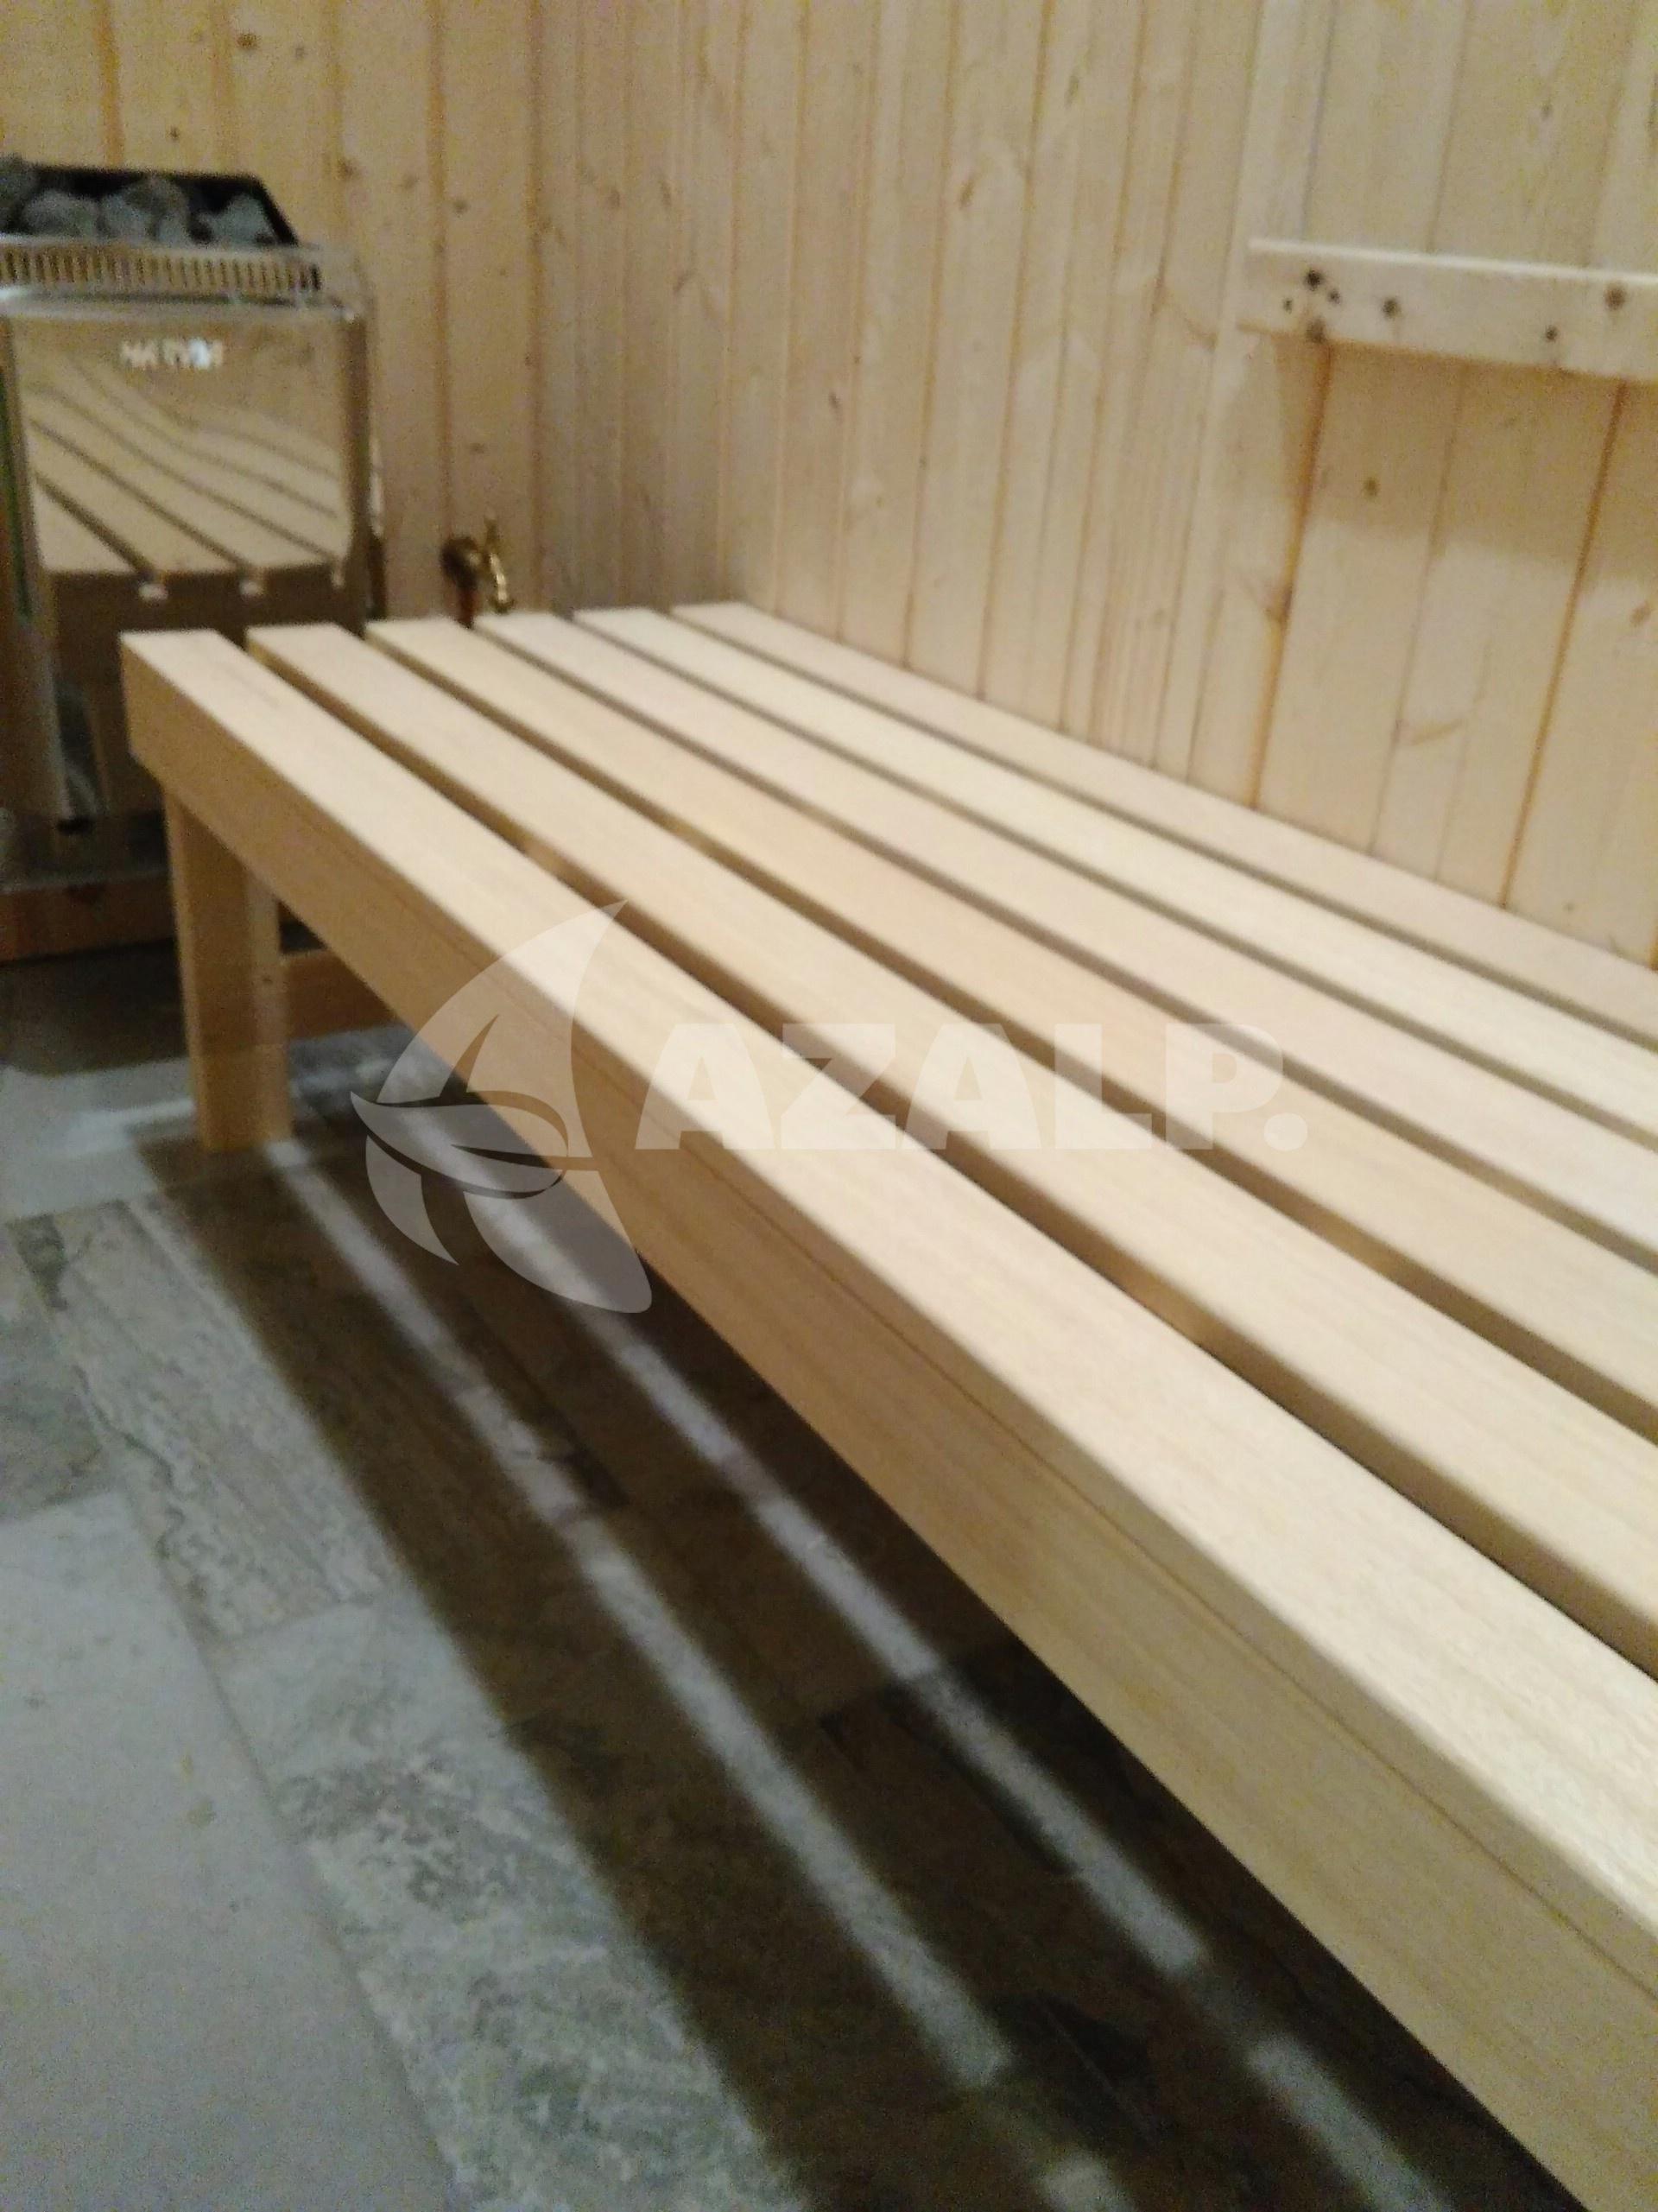 Azalp Saunabank freistehend, Abachi 50 cm breit Kaufen bei Azalp.de